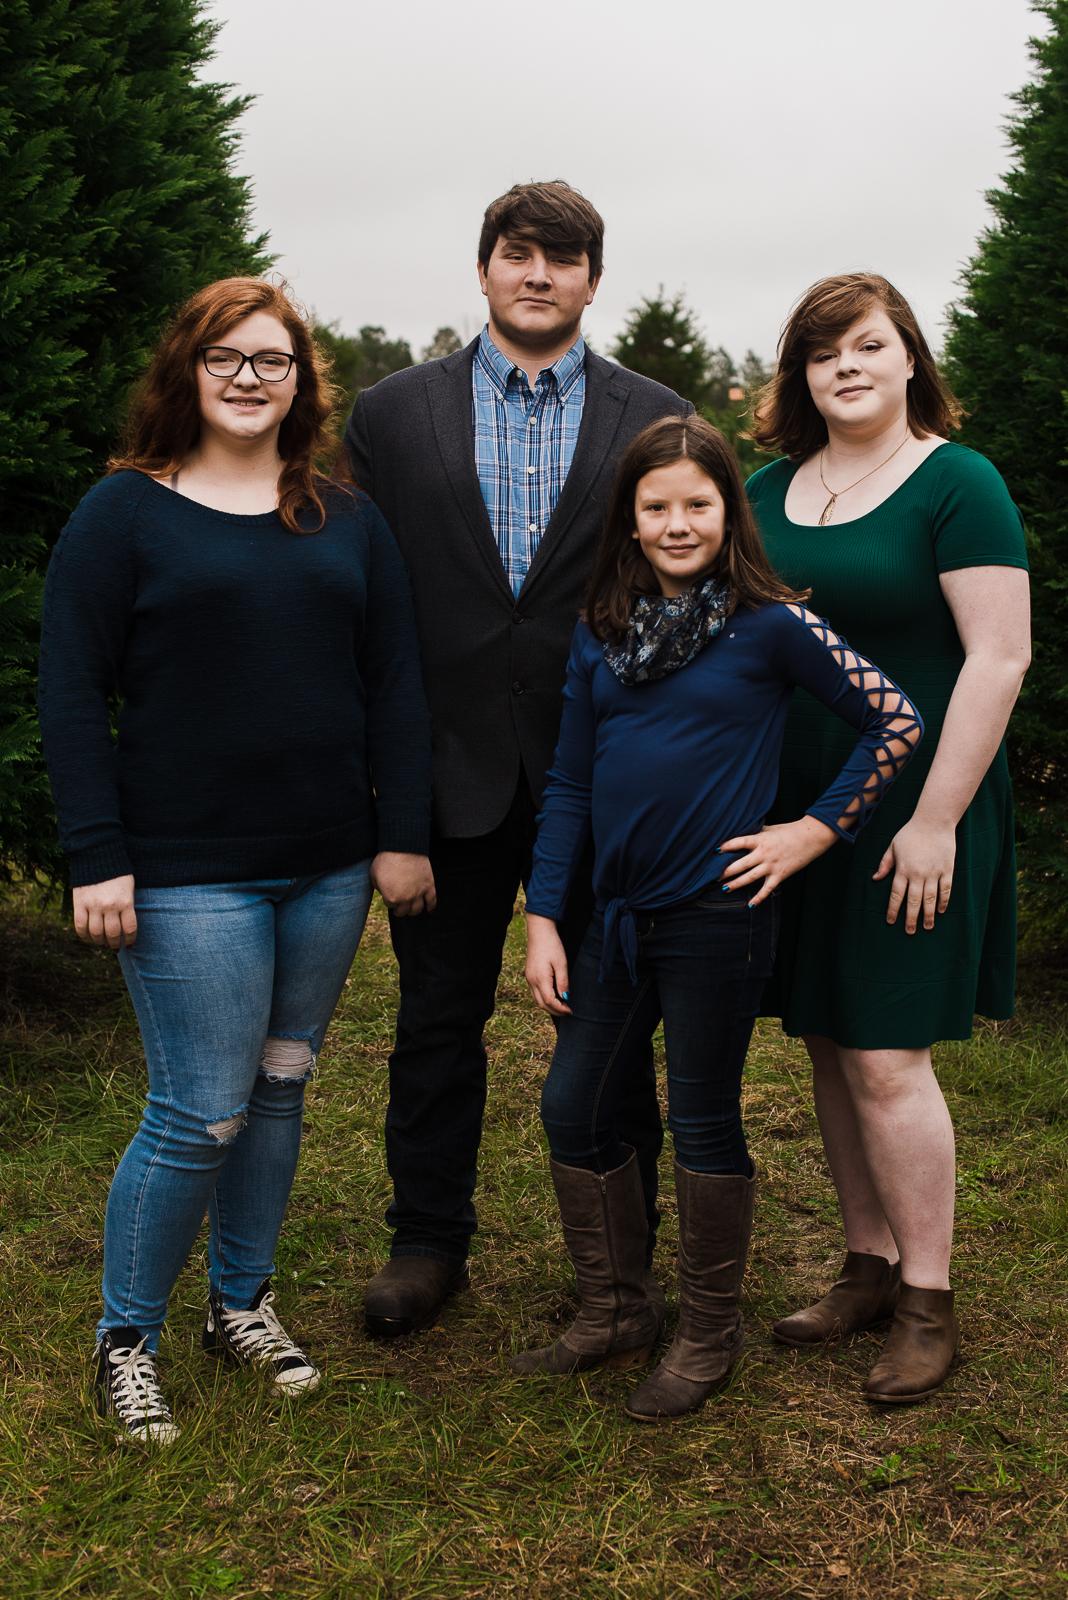 Hauffe-Family-Photos-Thomleys-Tree-Farm-12.jpg